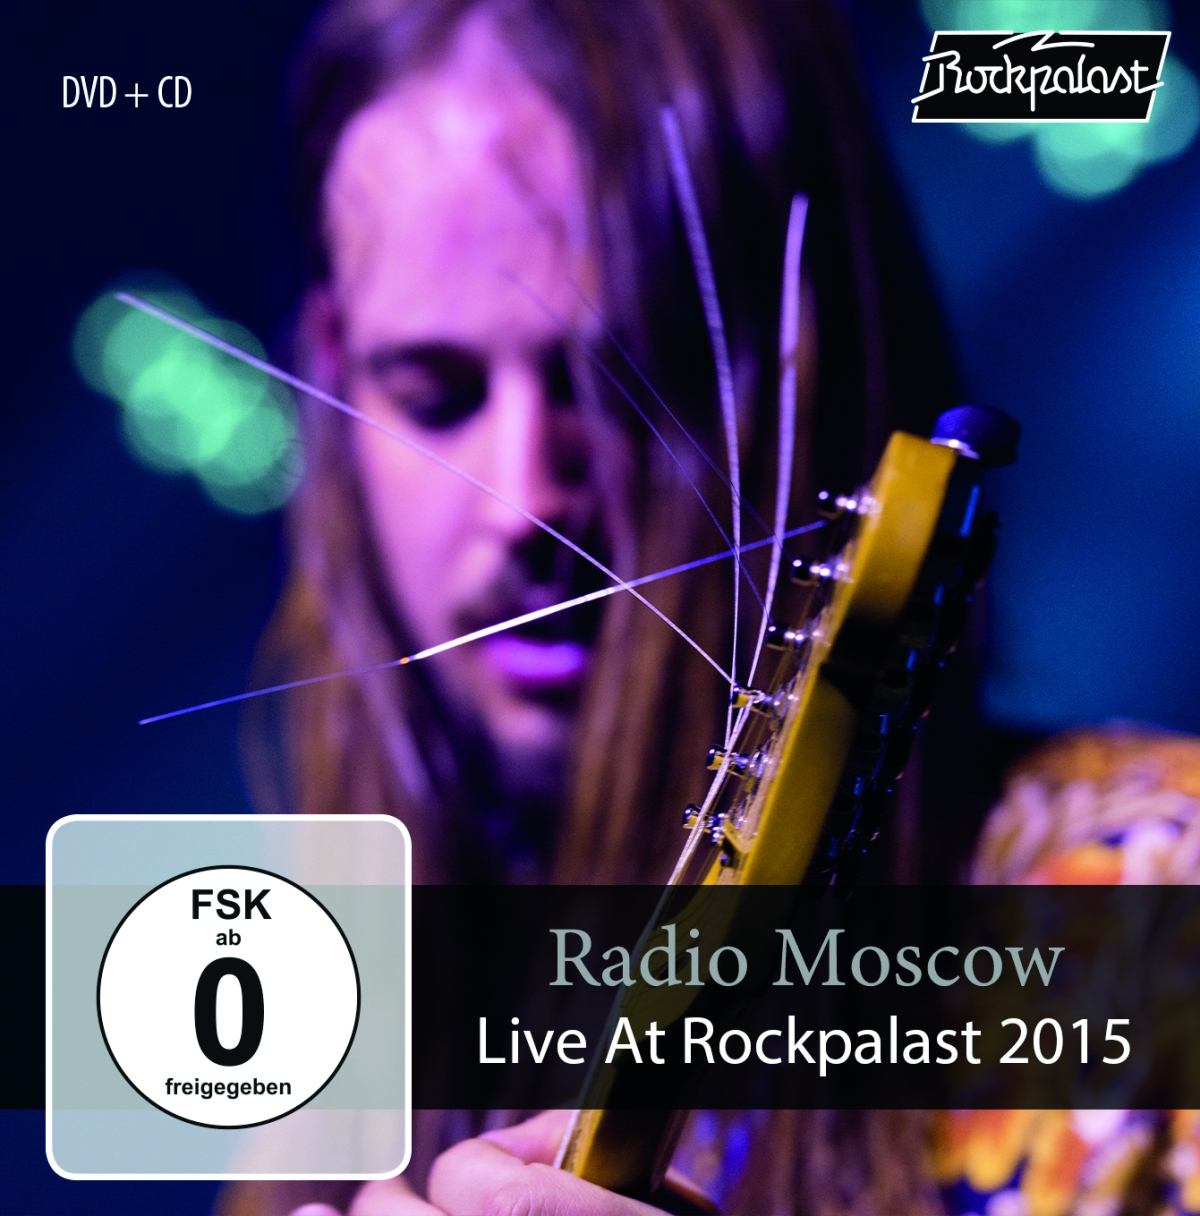 RADIO MOSCOW publica 'Crossroads Festival 2015' en 2CD +DVD vía MIGMusic